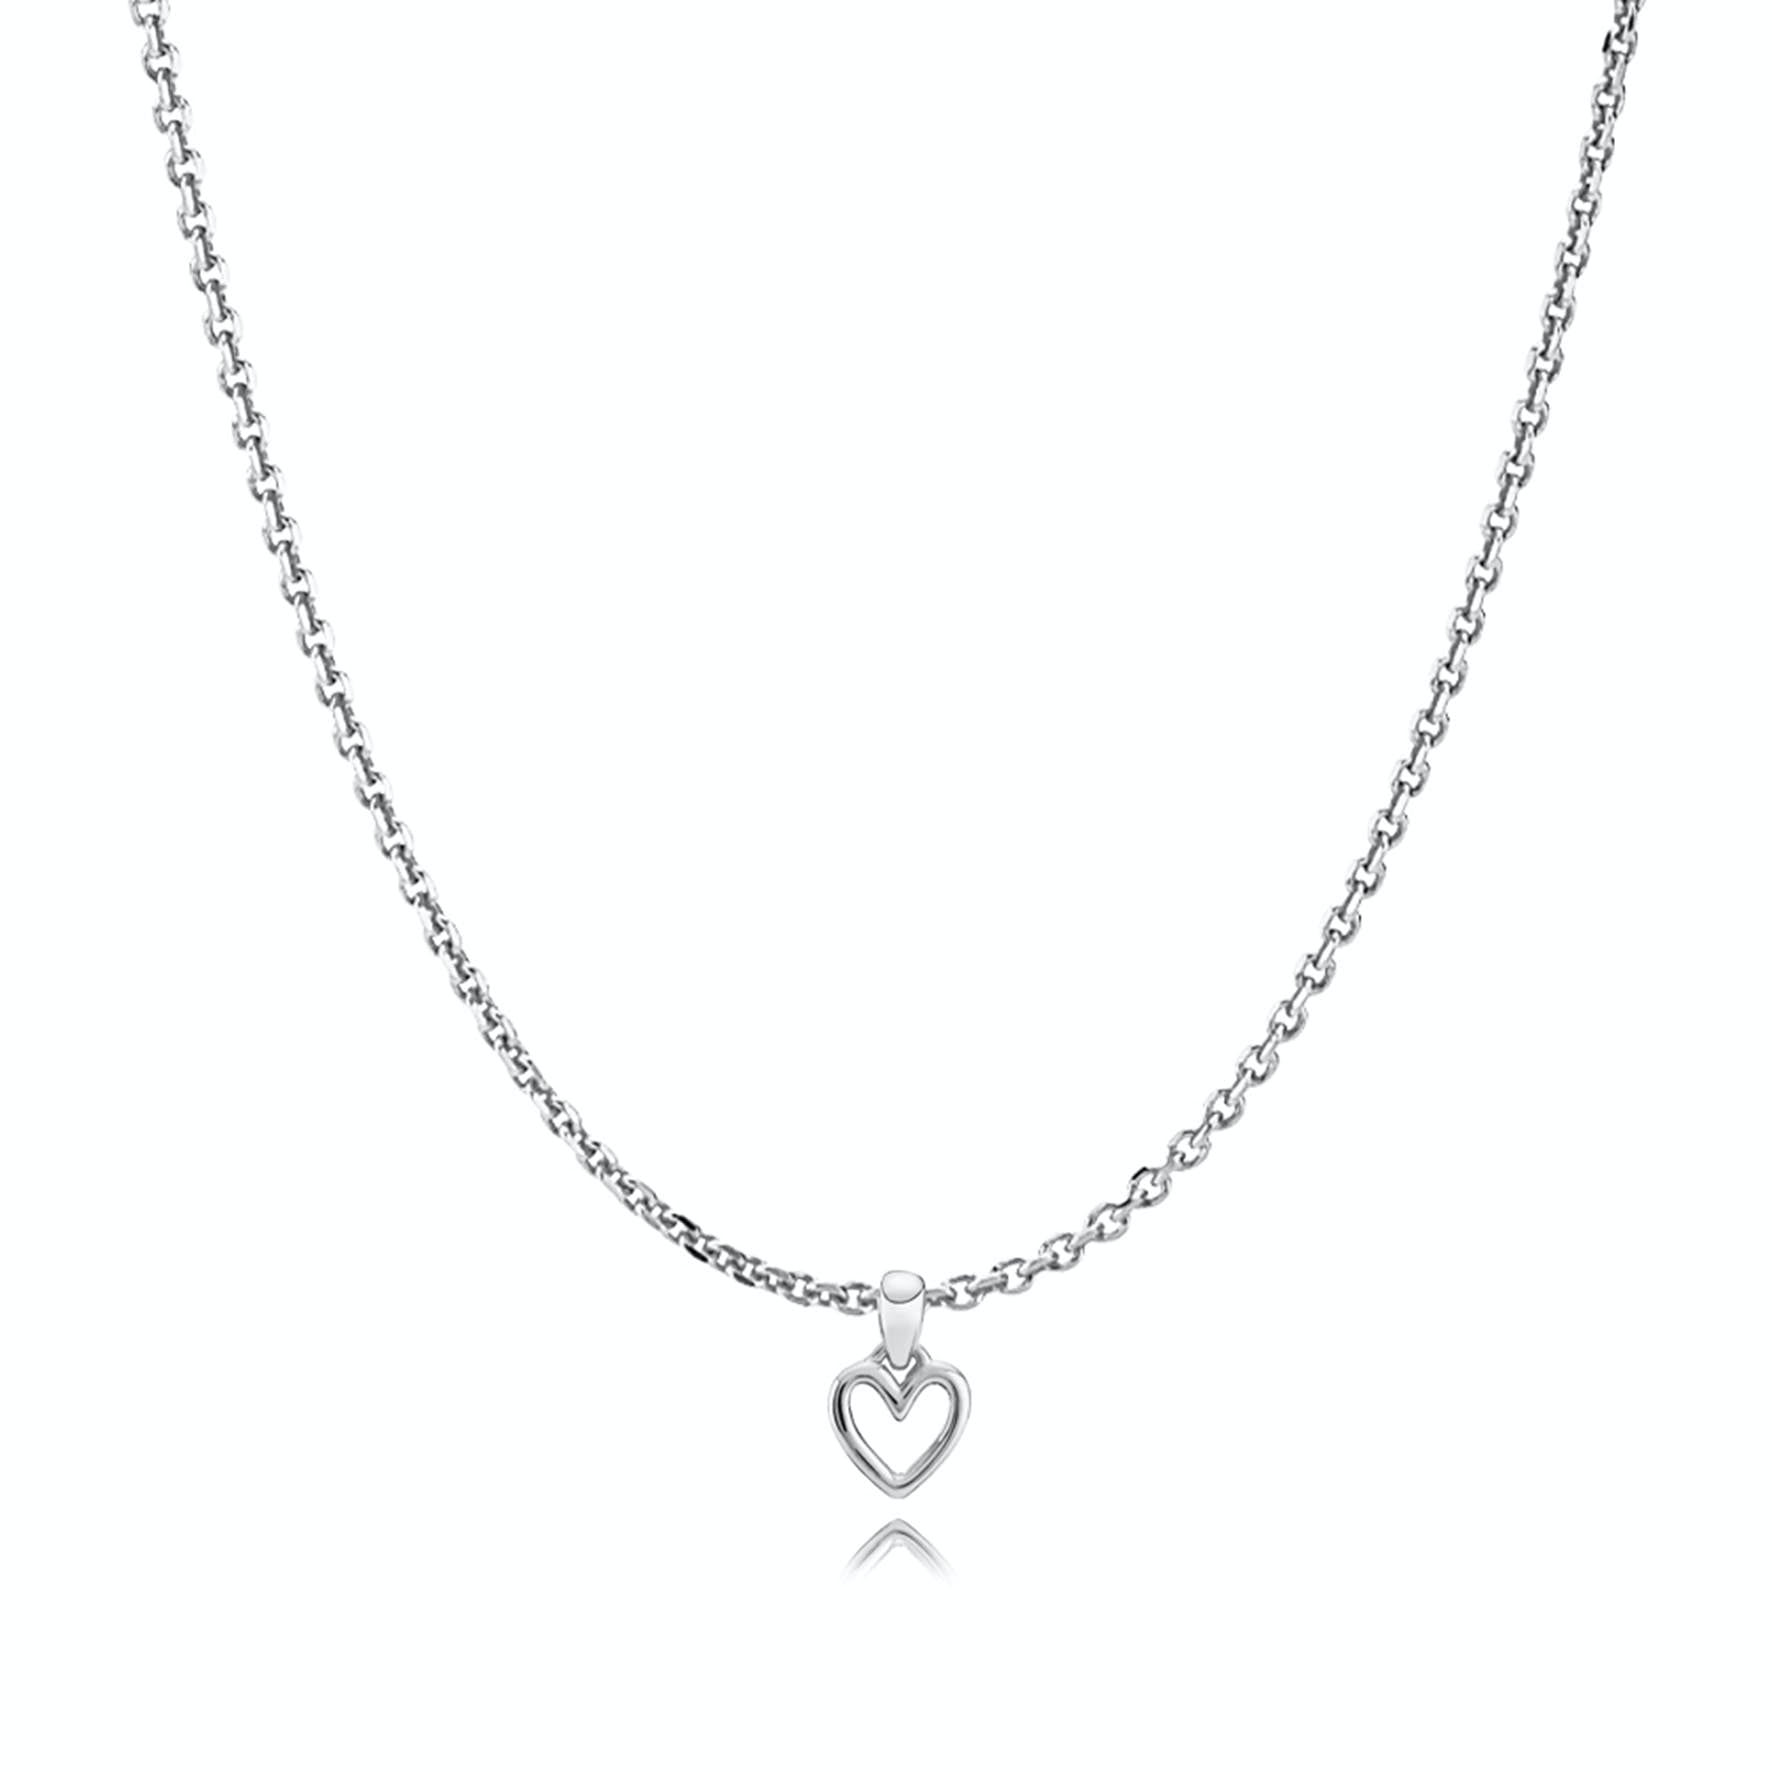 Love Charity Necklace von Izabel Camille in Silber Sterling 925